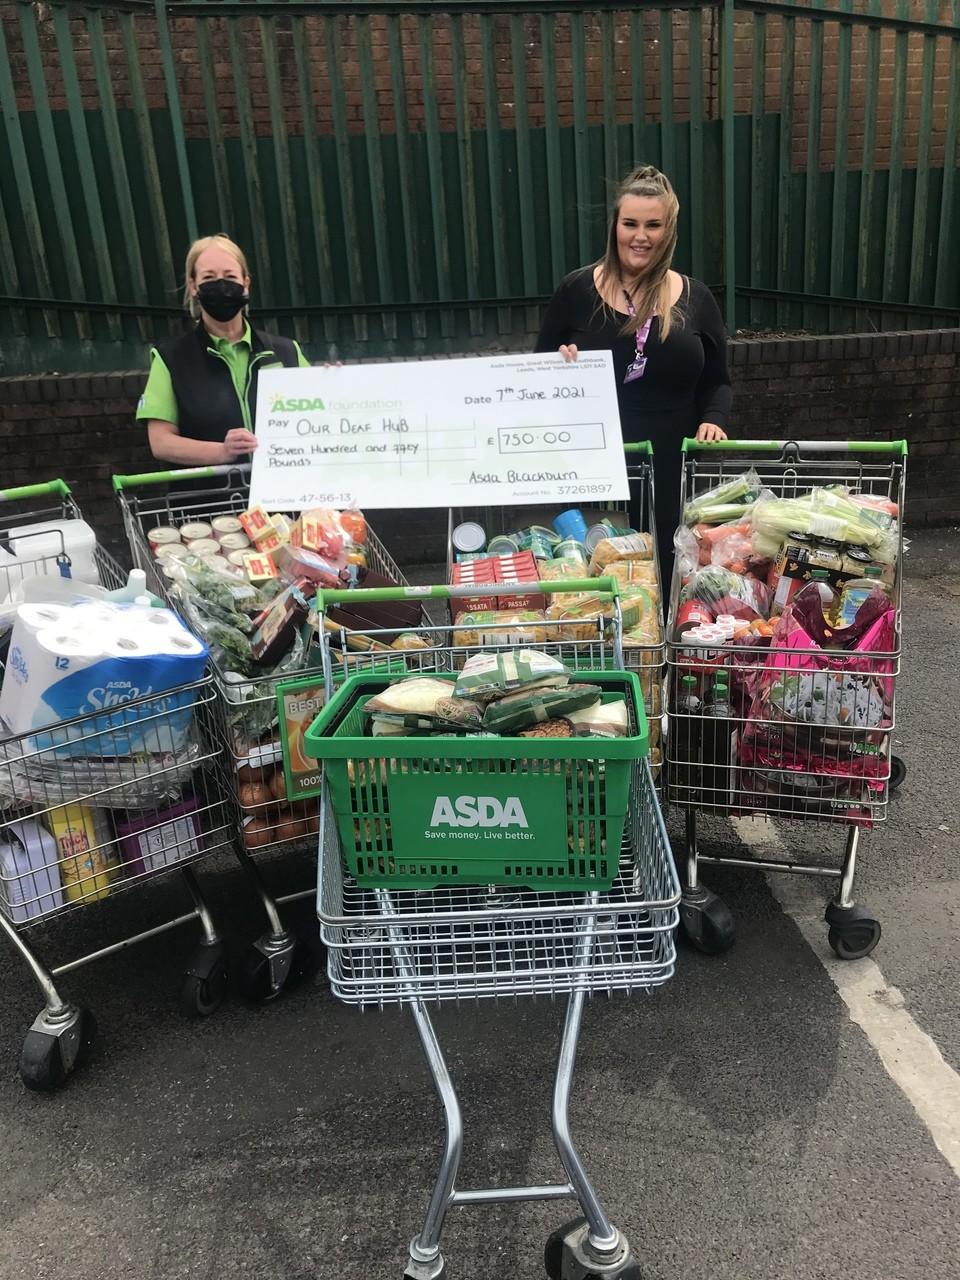 £750 grant for Our Deaf Hub | Asda Blackburn